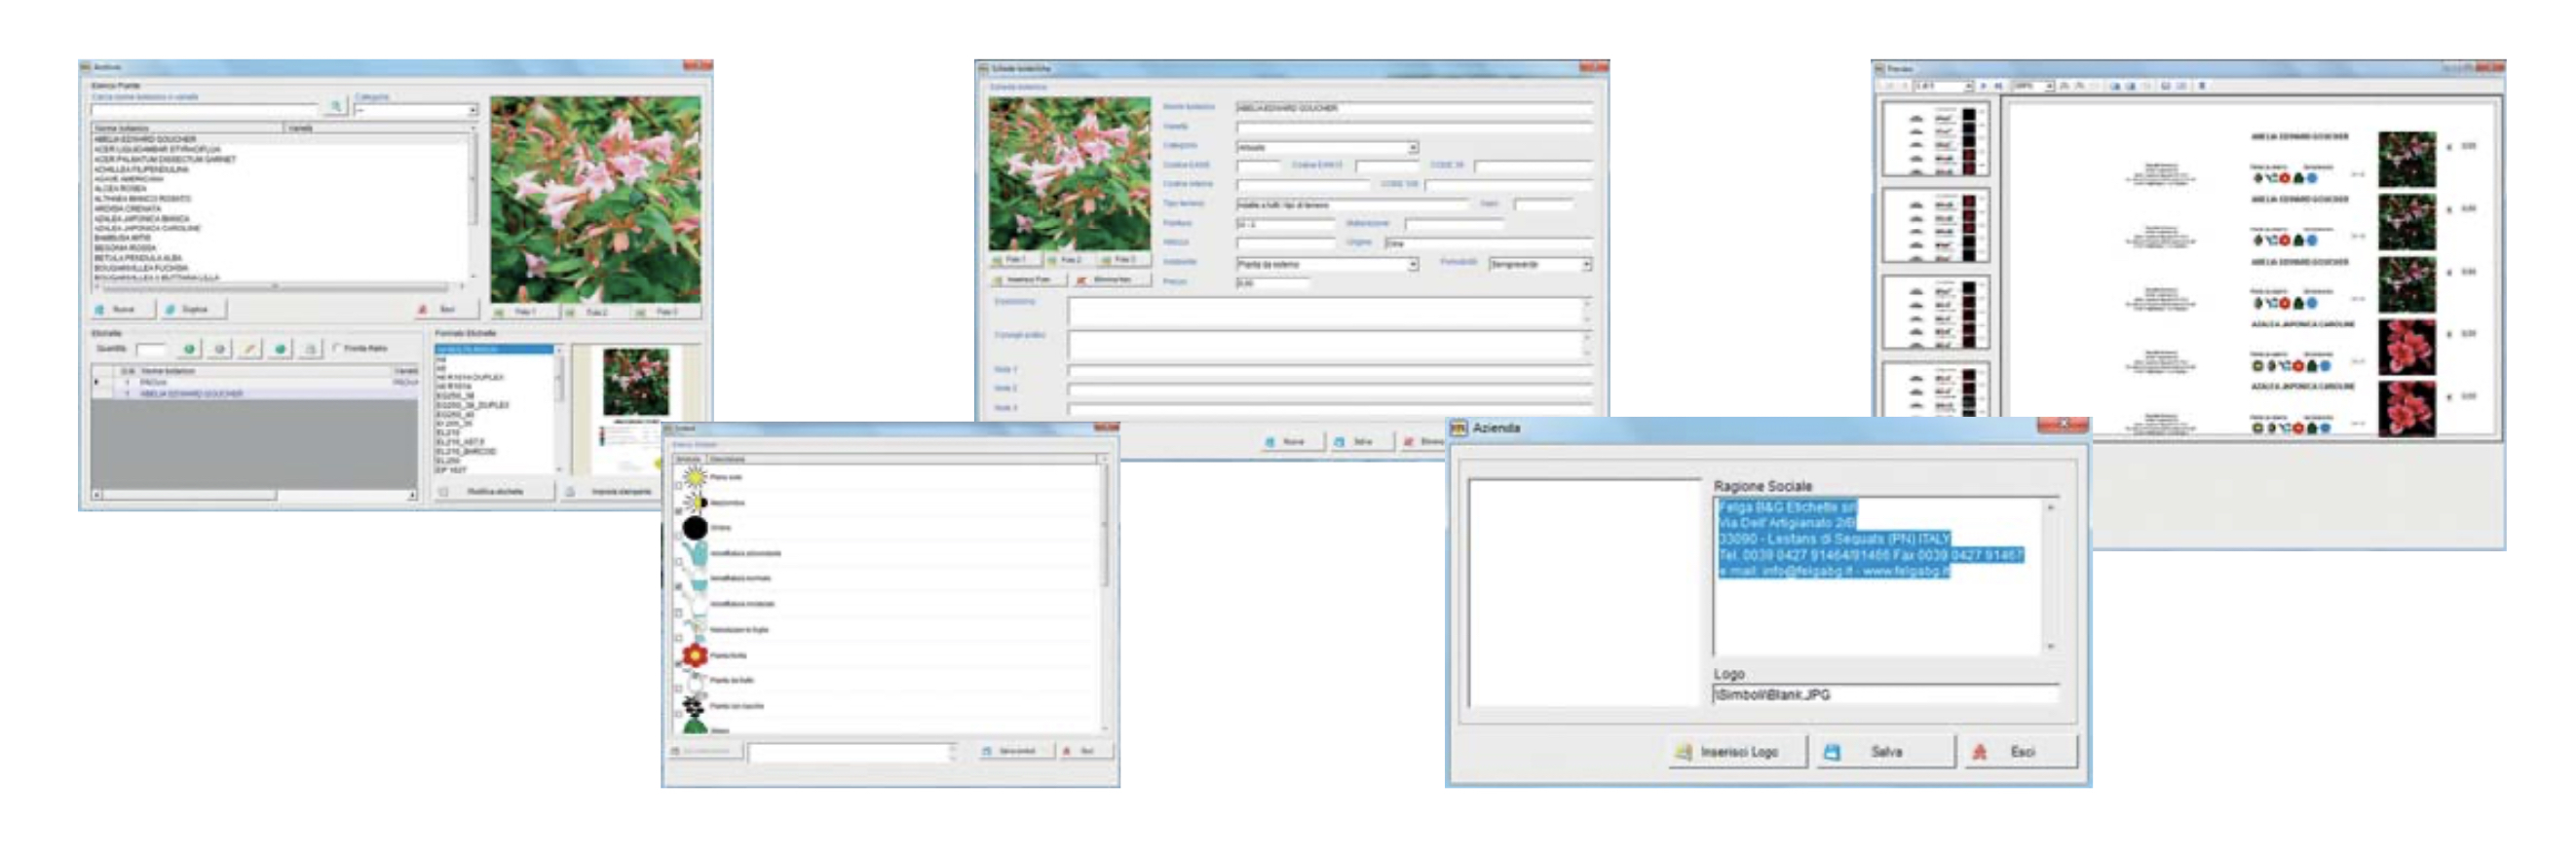 Felga-Print-Label-Etikettendruckprogramm